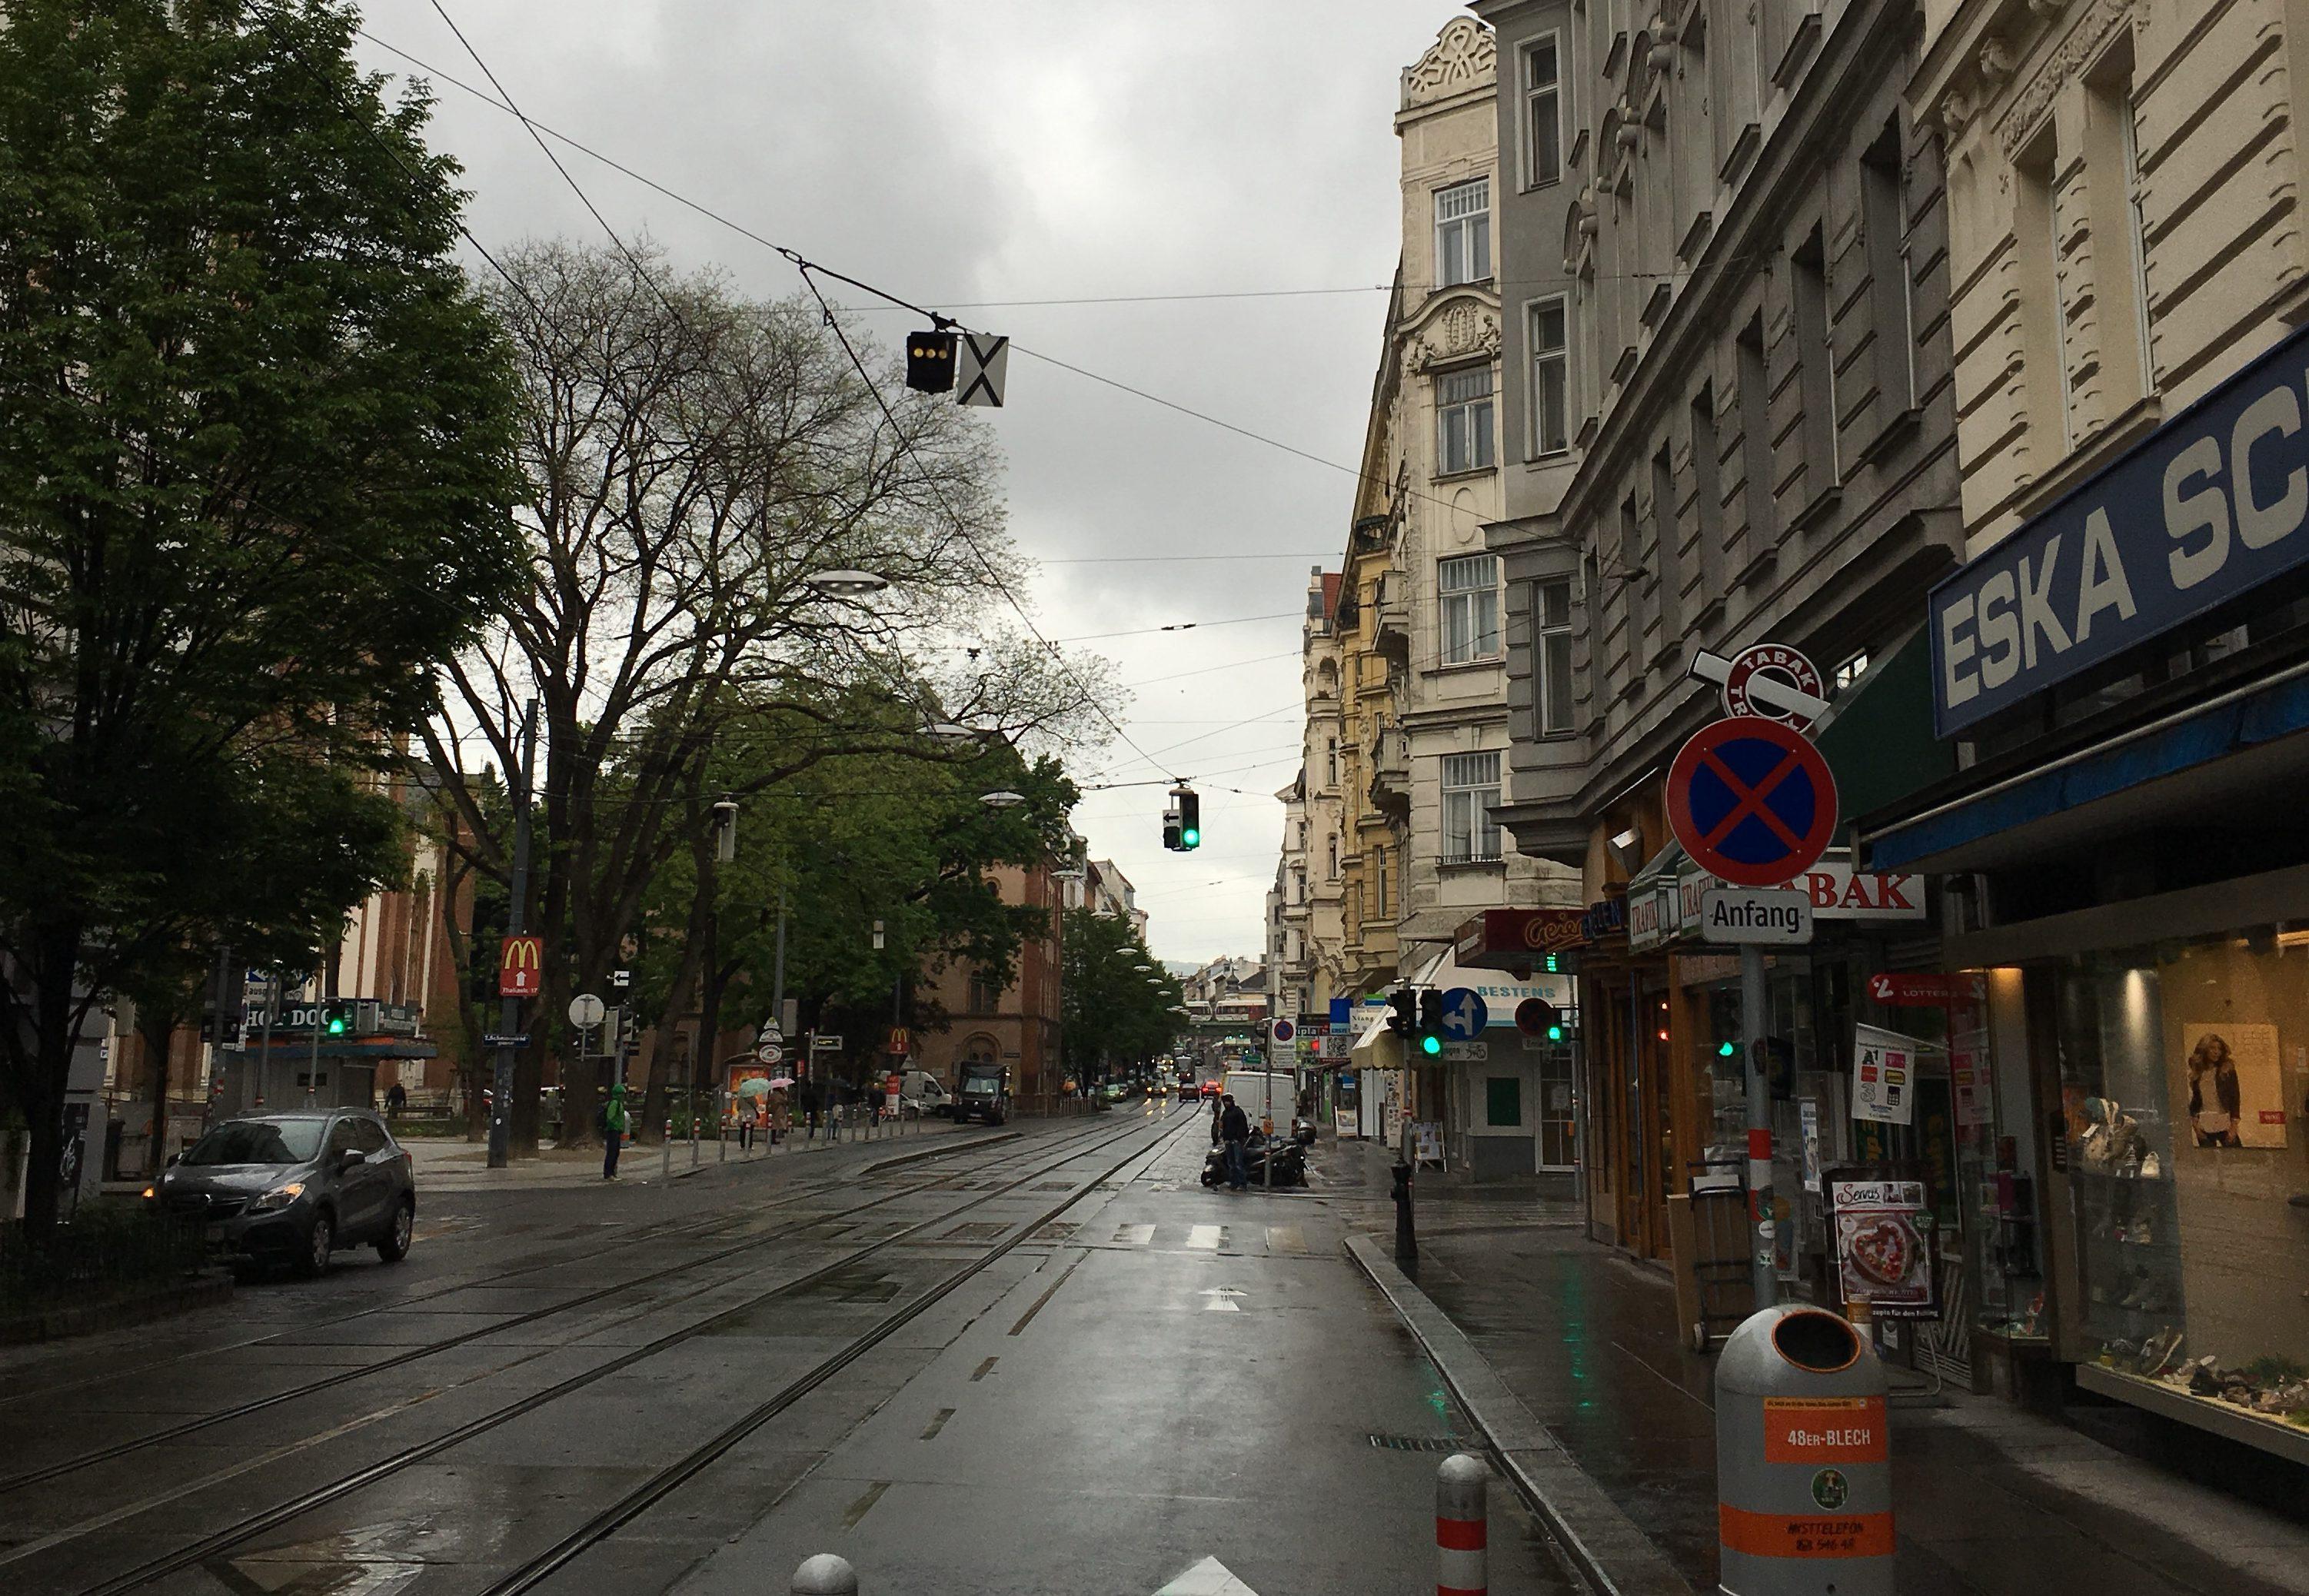 Viennese Wandering